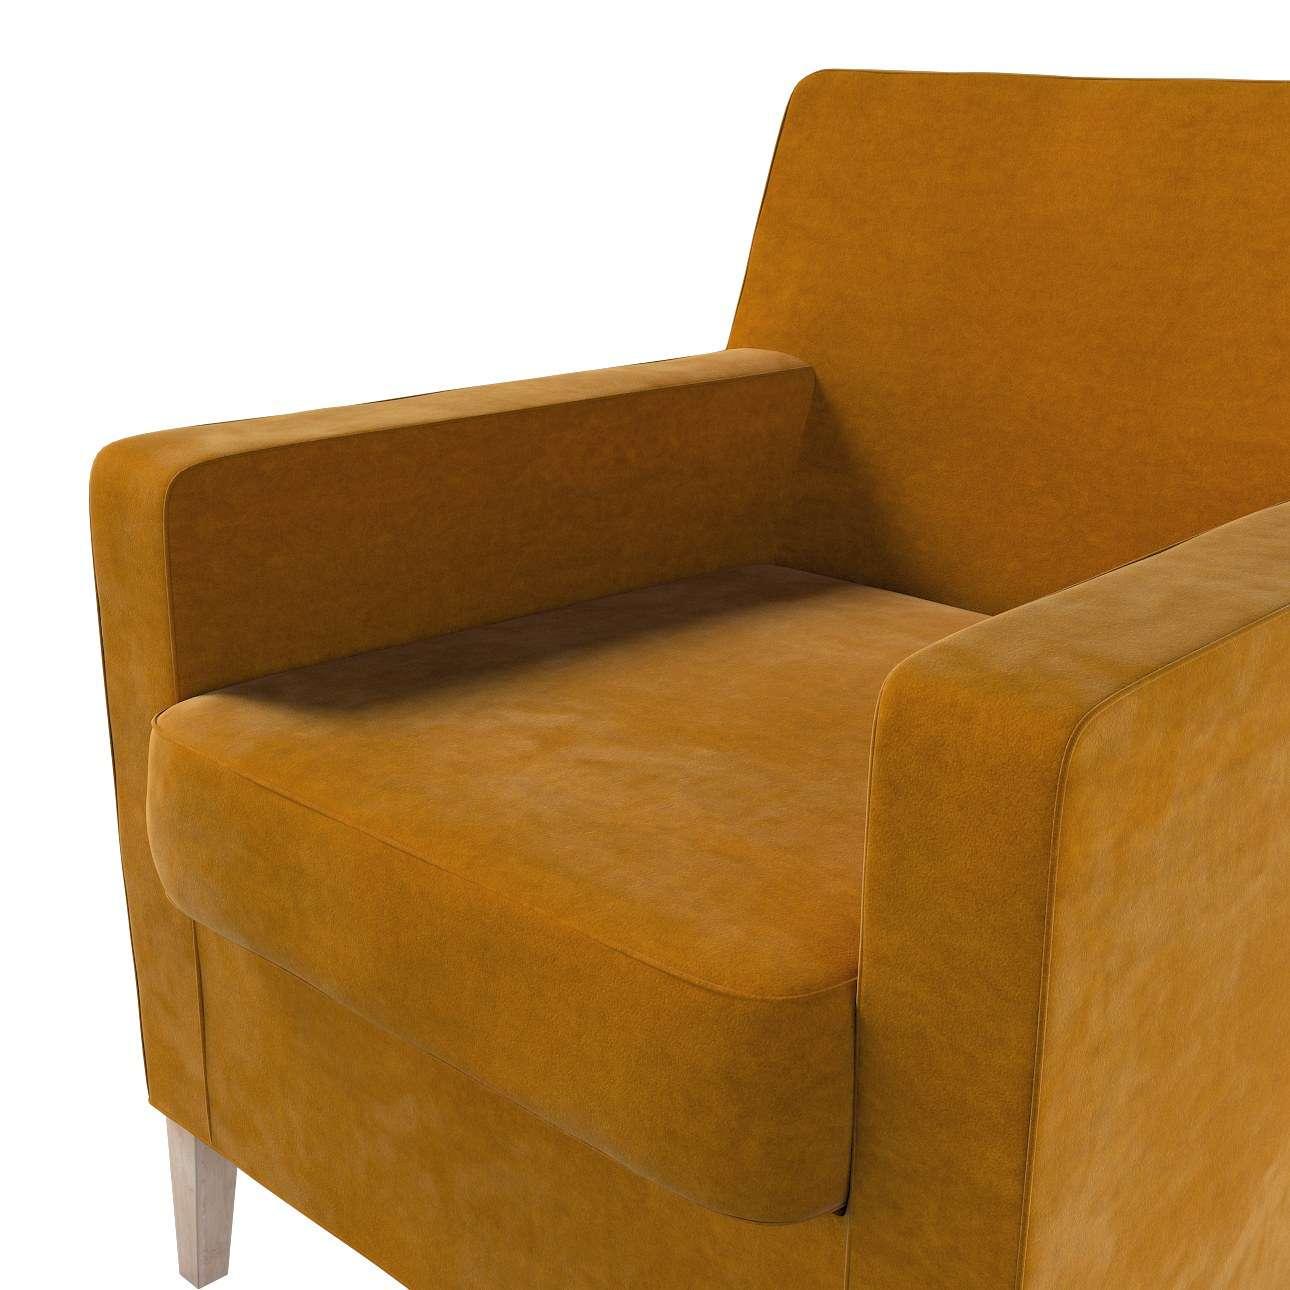 Pokrowiec na fotel Karlstad w kolekcji Velvet, tkanina: 704-23